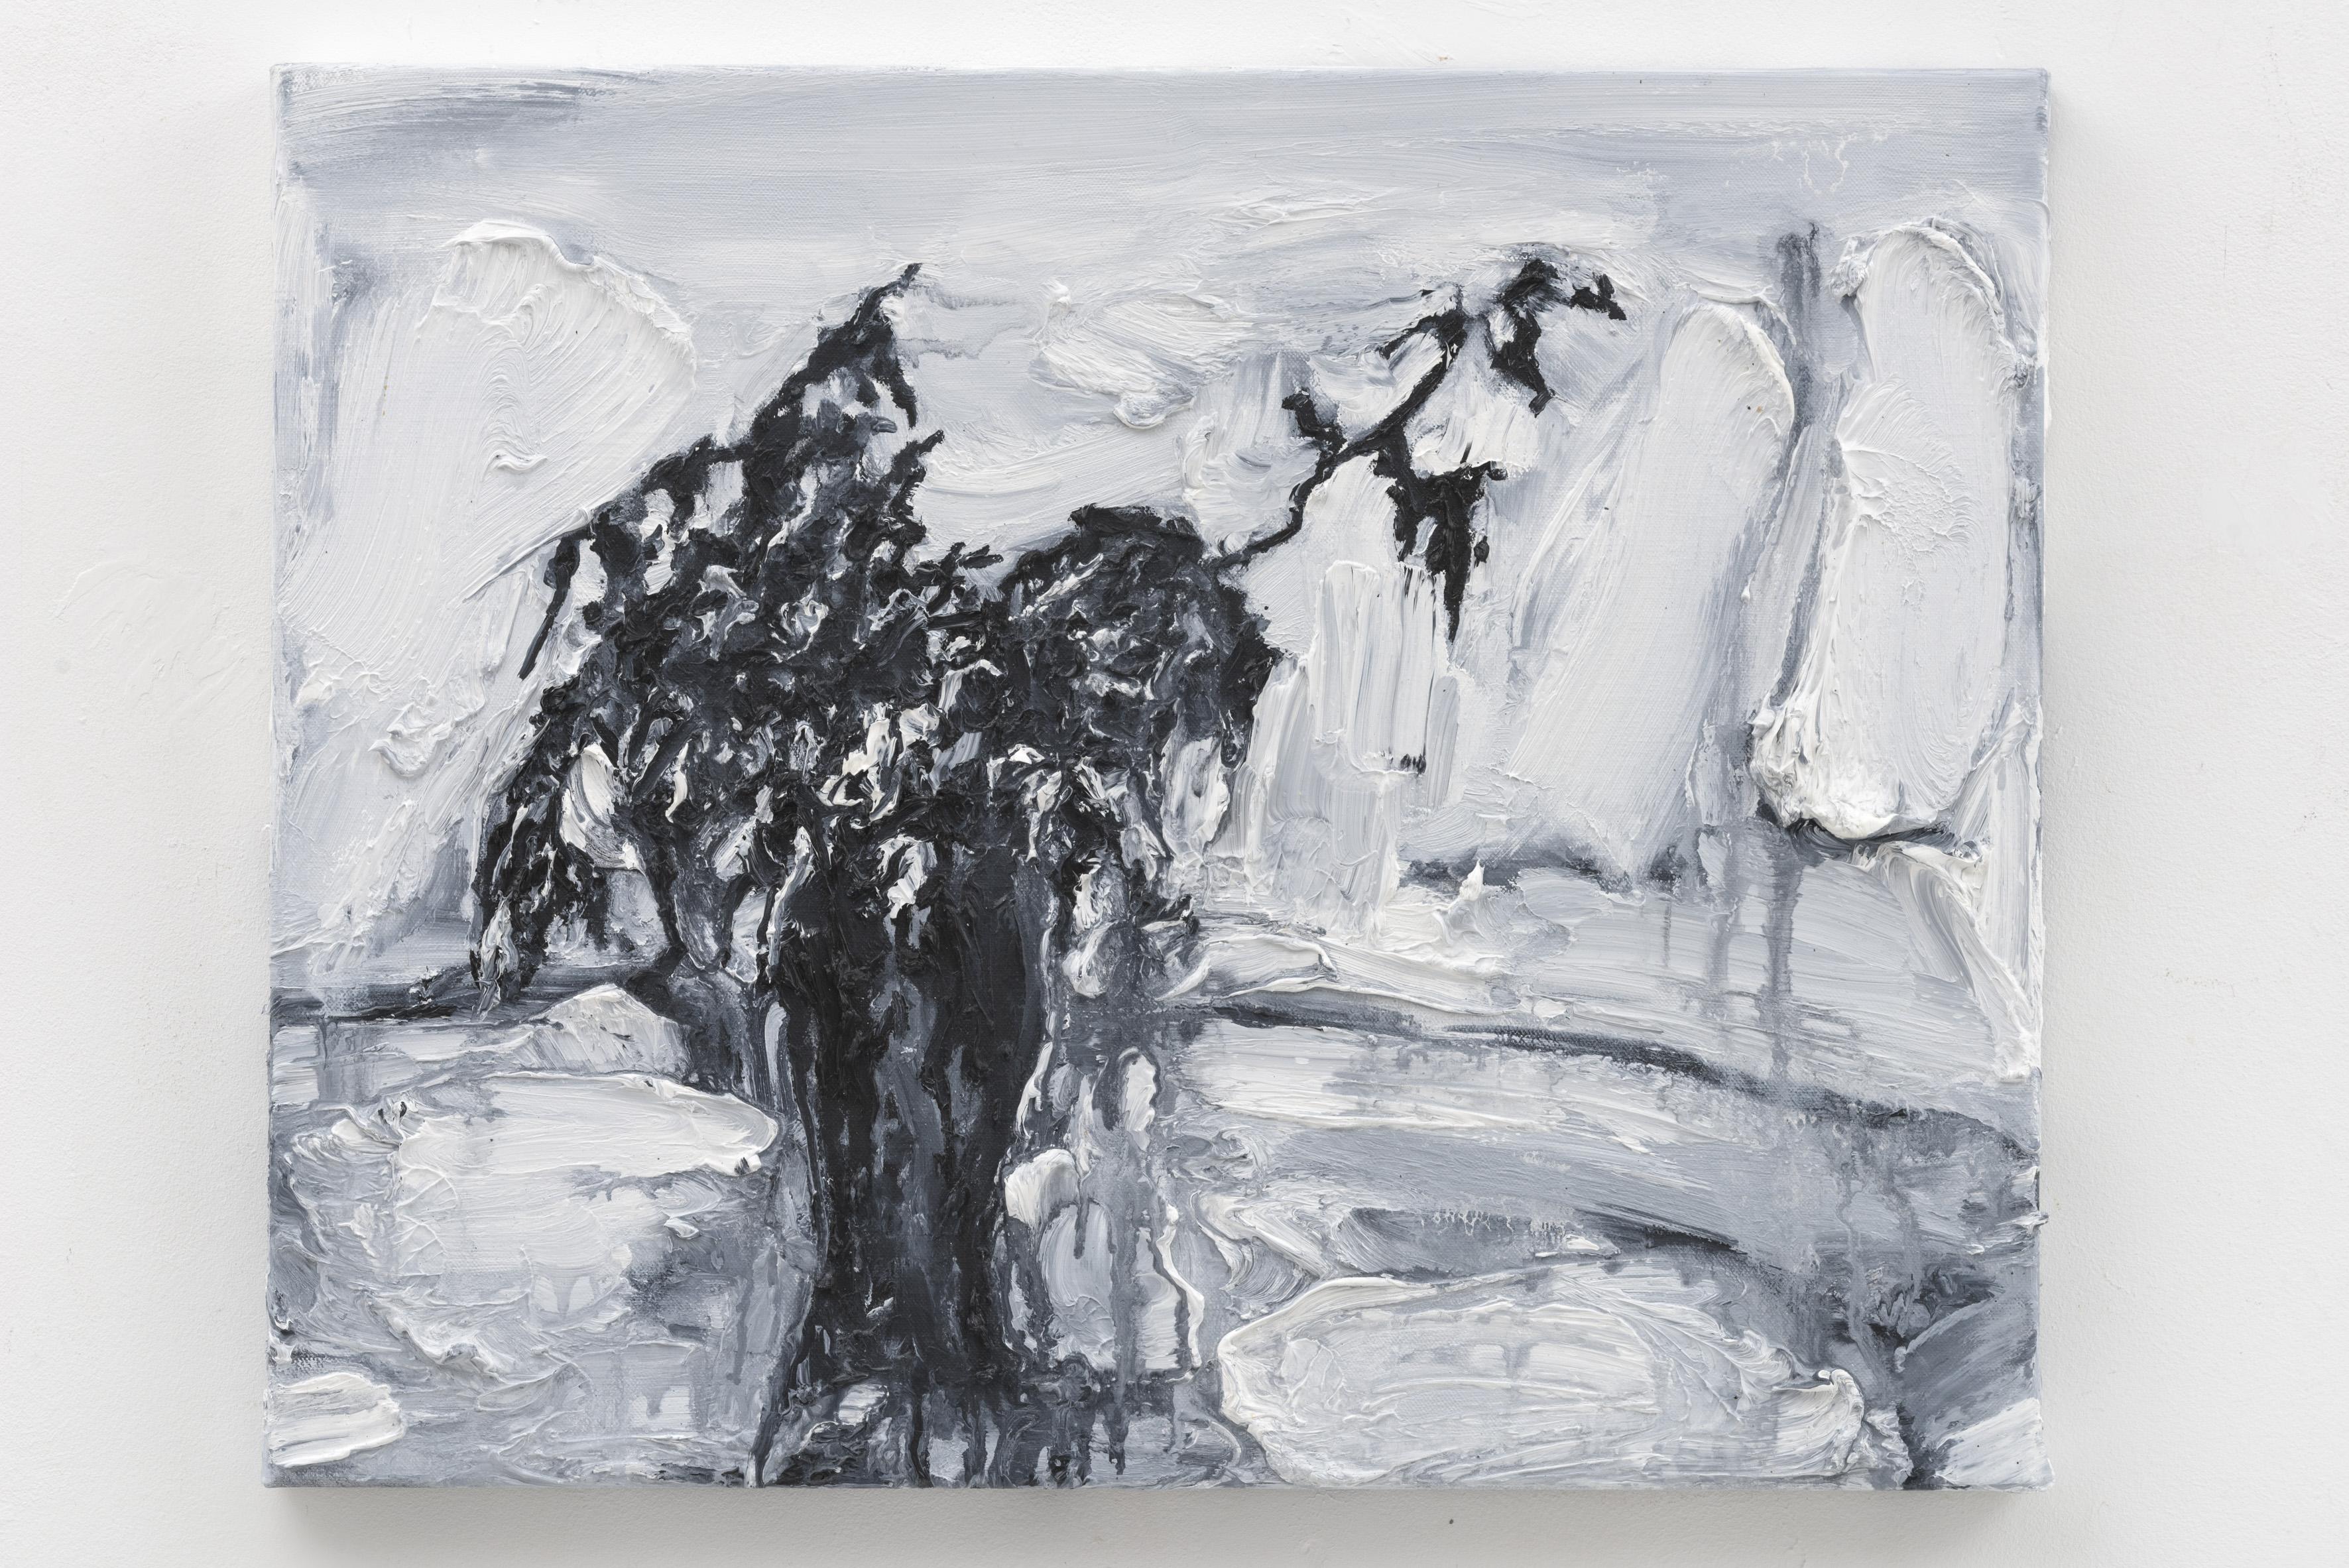 """Dessecado II"", 50 x 40 cm., oil on linen 2017 (Portugal)"